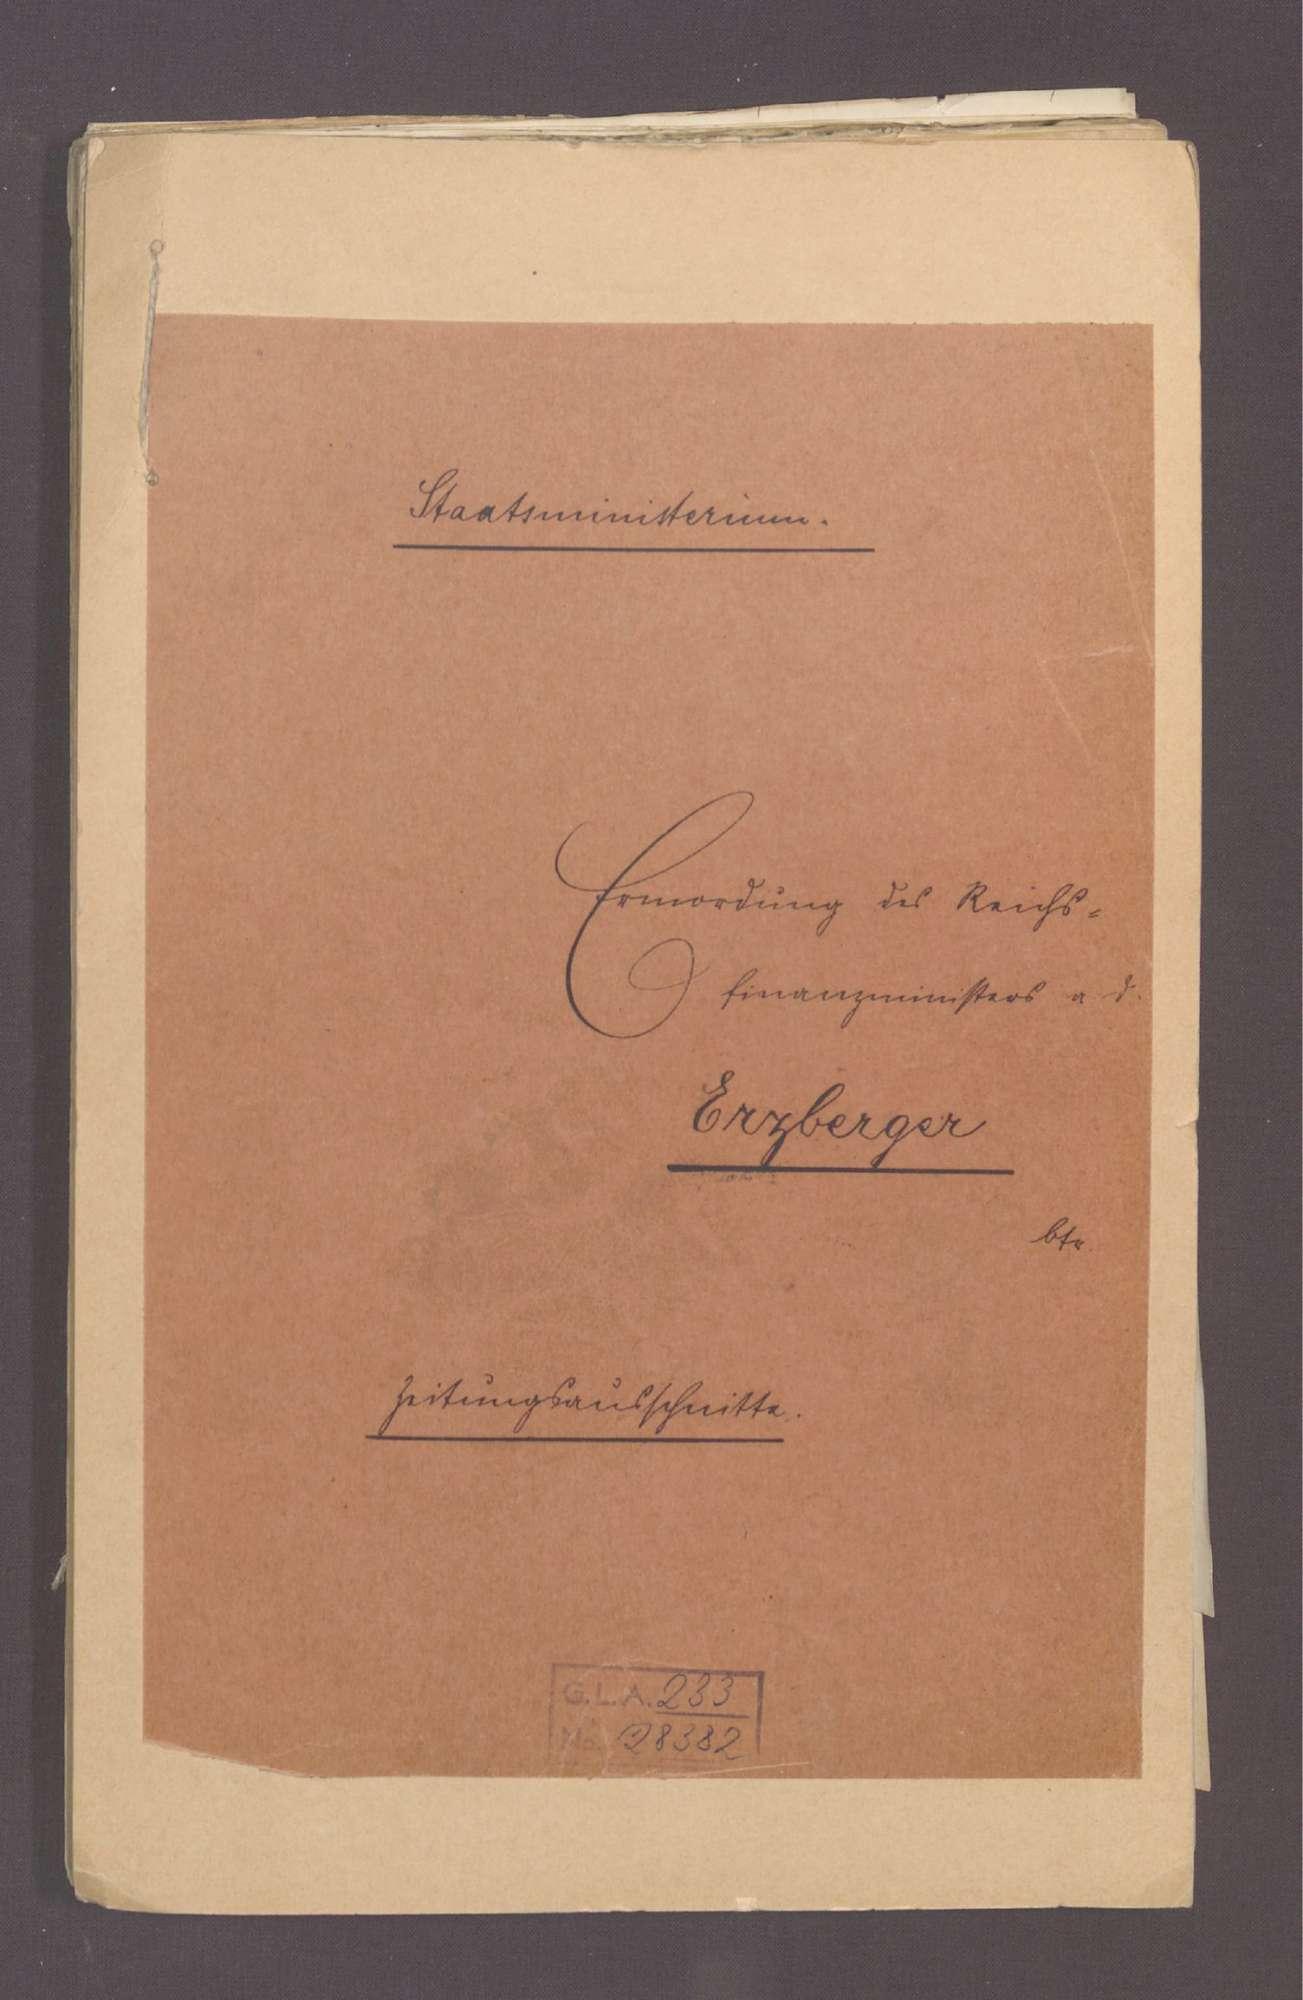 Zeitungsausschnitte zur Ermordung des Reichsfinanzmininsters a. D. Erzberger, Bild 1